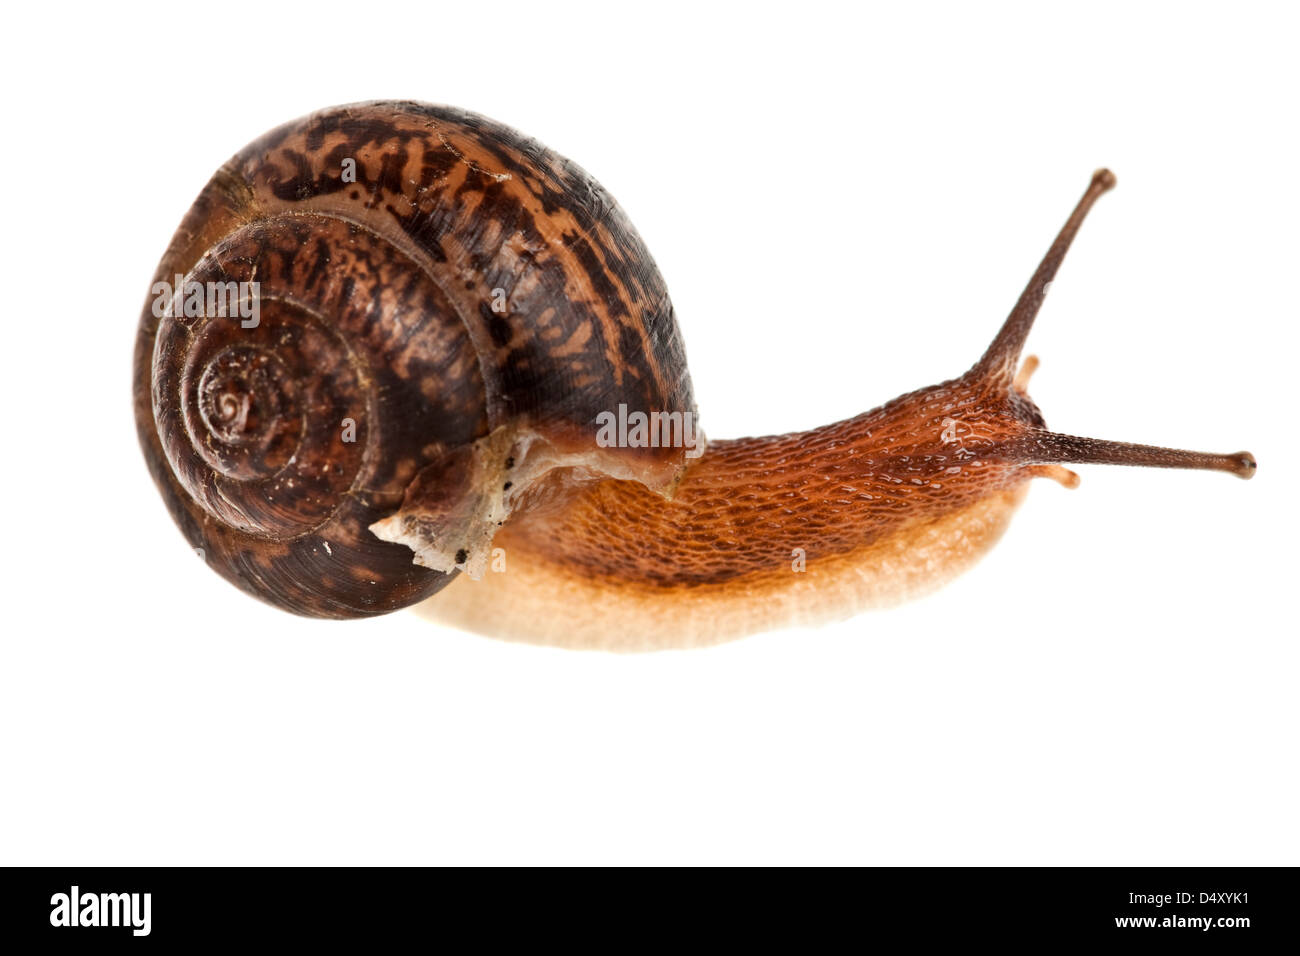 edible snail on a white background Stock Photo